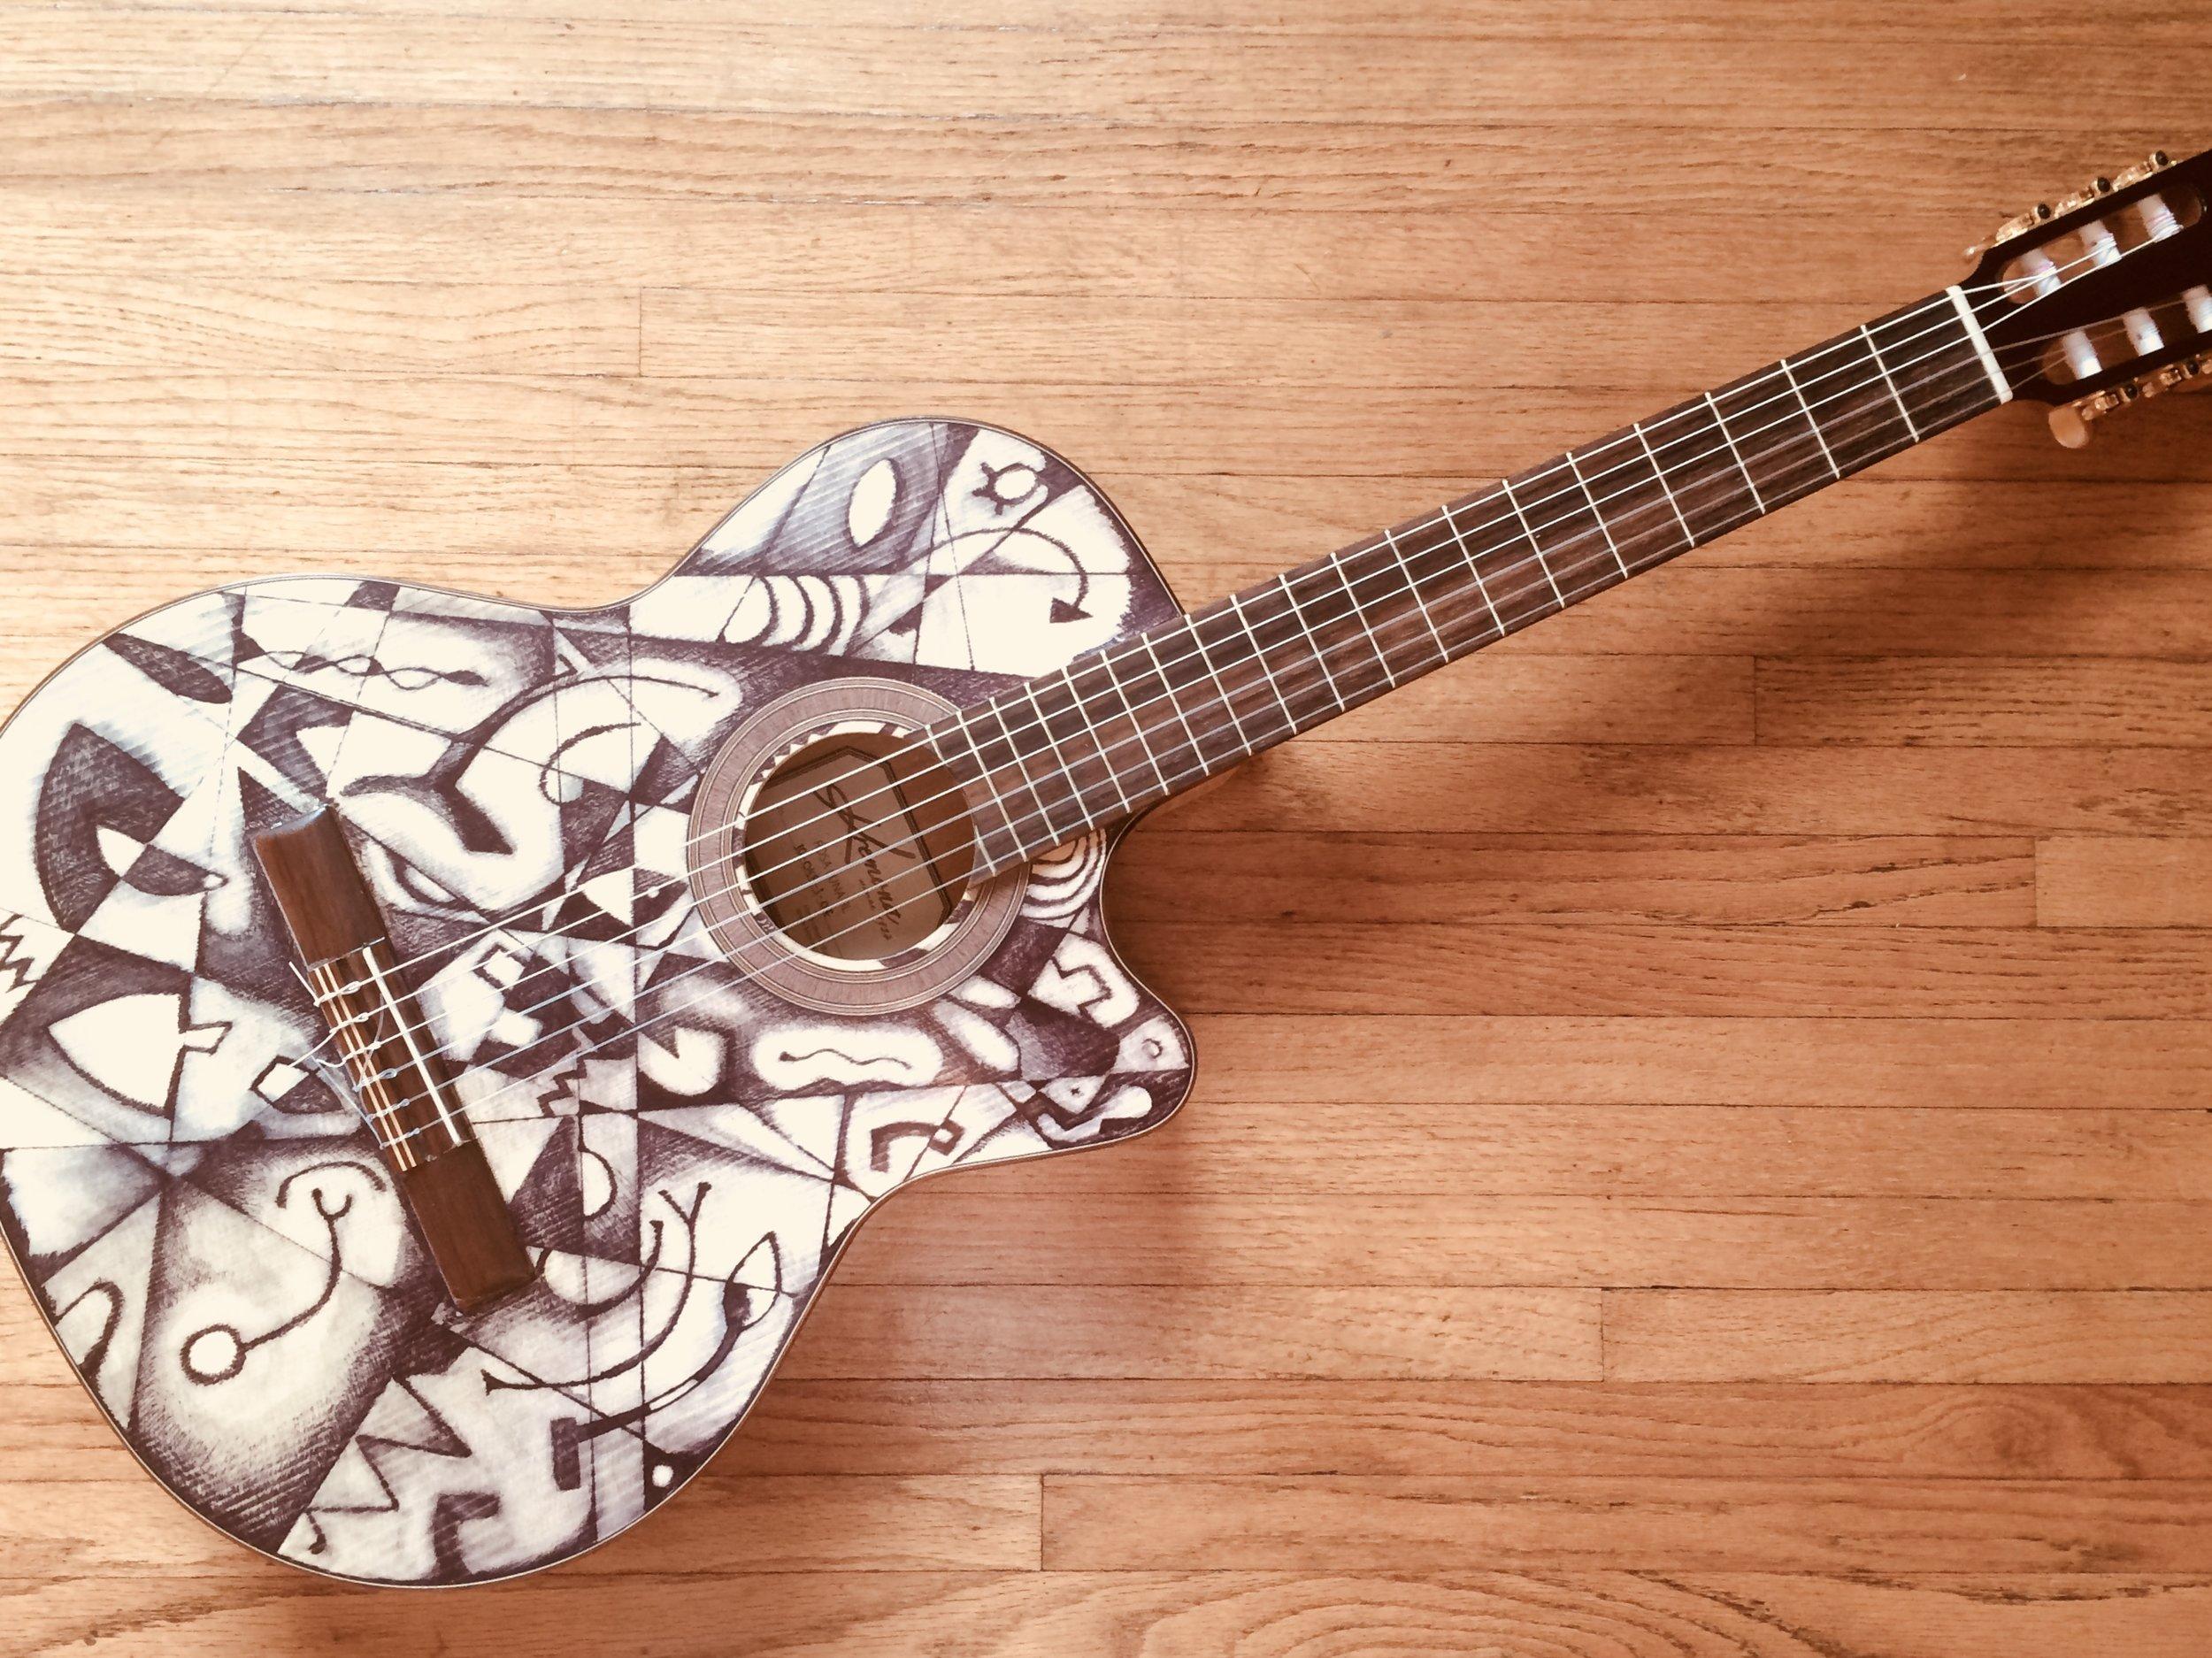 Kremona Rosa Luna , electric acoustic Flamenco guitar. Black and white lacquer. Around 4 mils thin. $1400.00